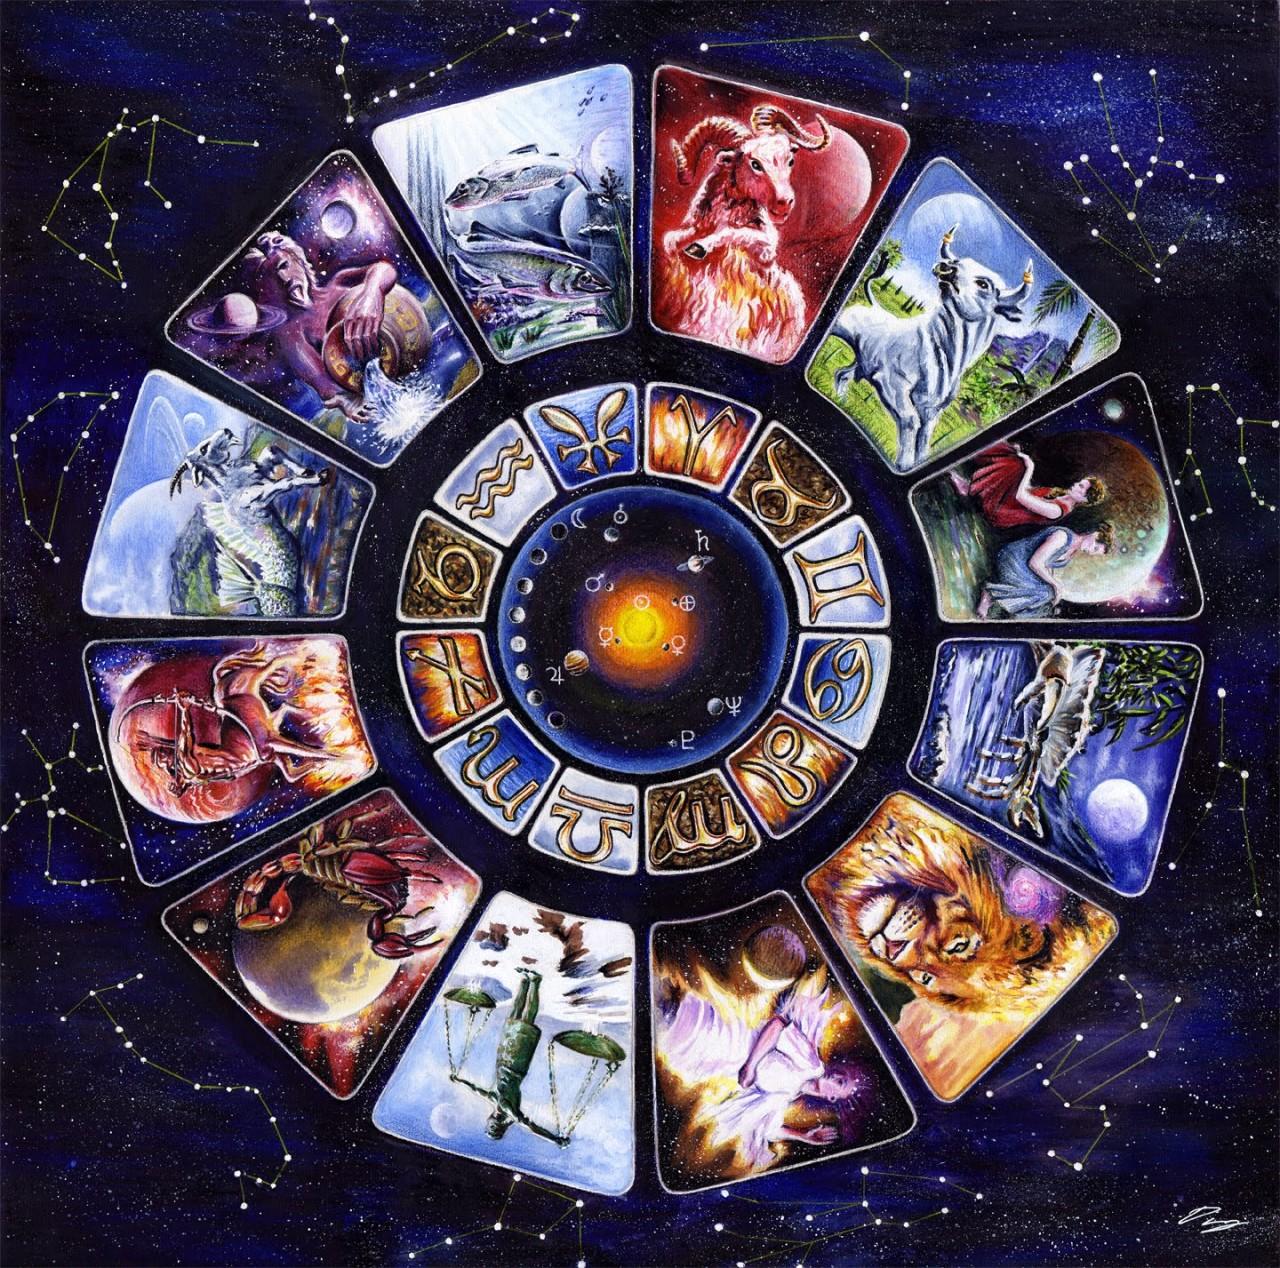 картинки колдовских знаков зодиака меня